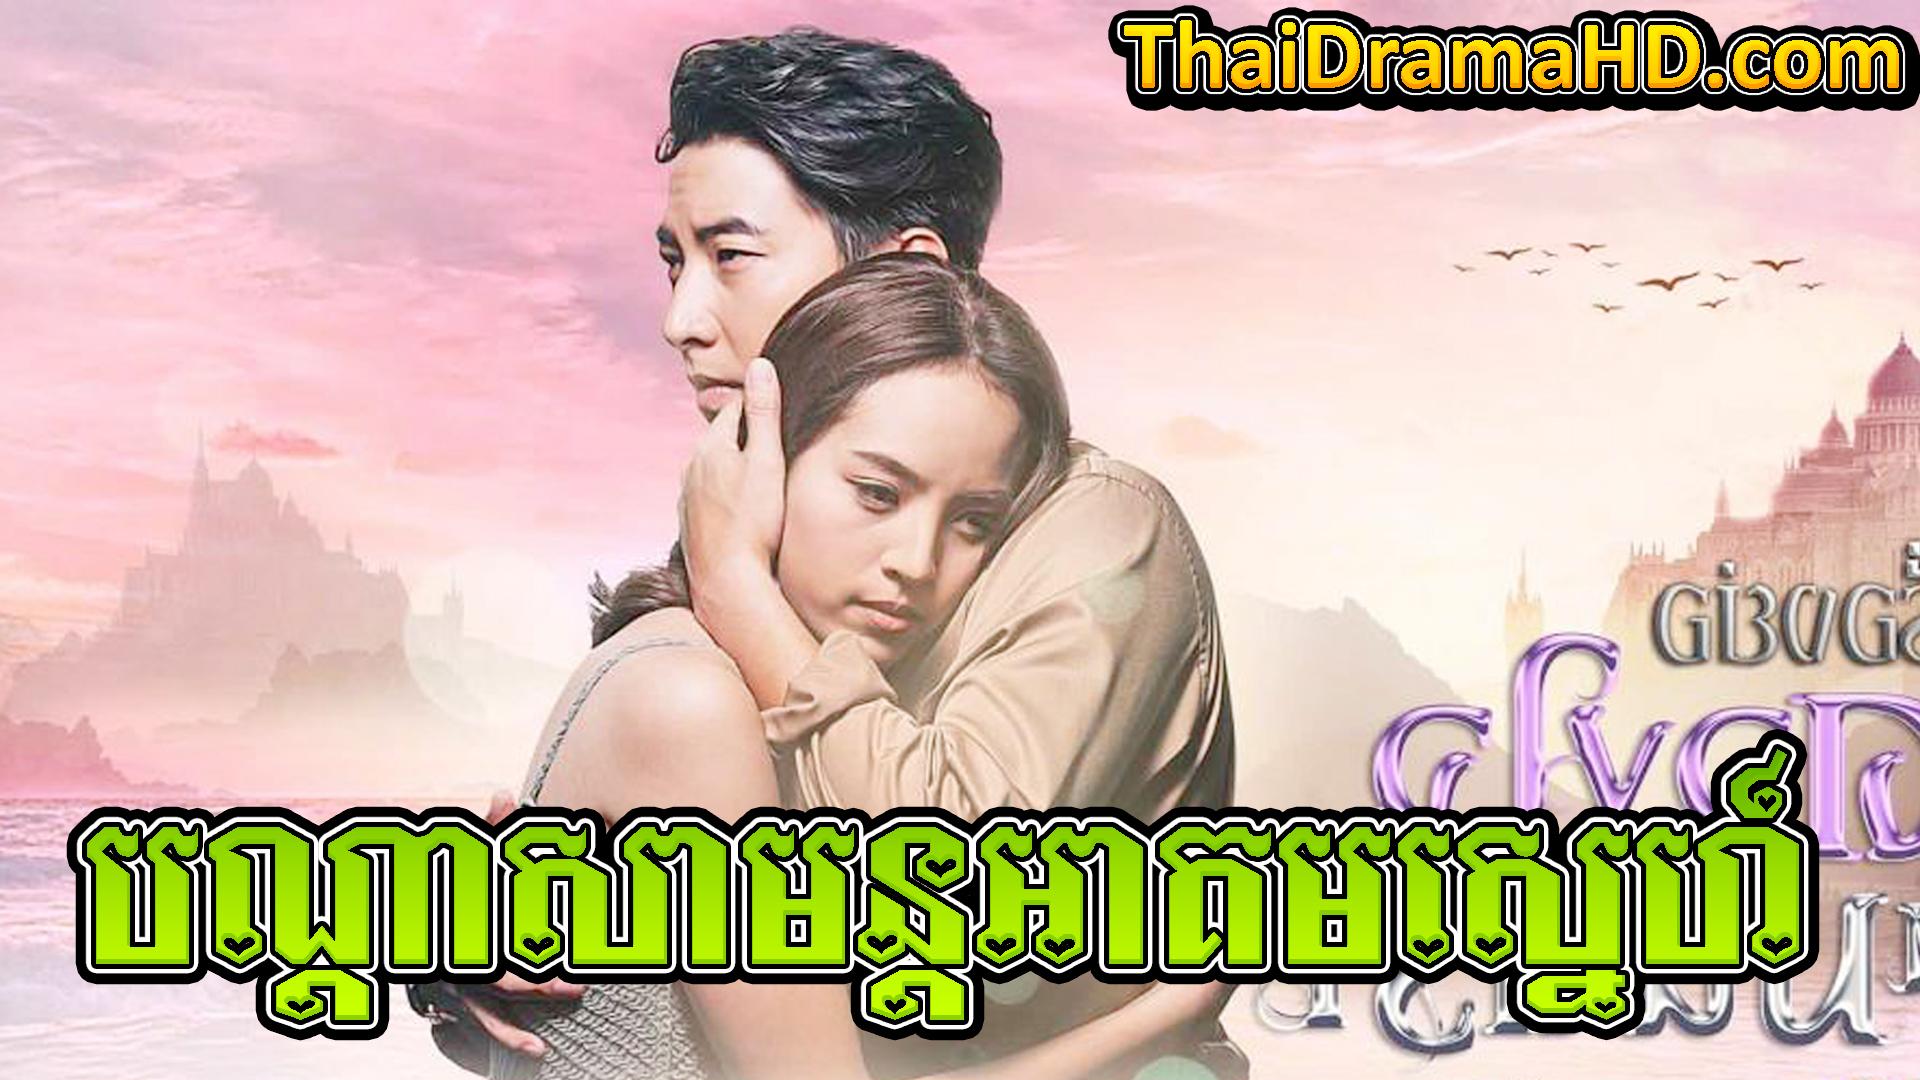 Bandasa Mun Akum Sne | Thai Drama | Khmer Movie | Phumikhmer | movie-khmer | video4khmer | khmotions | kolabkhmer | khmer drama | ksdrama | cookingtips | roscheat | khmertimeskh | khmerkomsan | phumi7 | merlkon | film2us | movie2kh | sweetdrama | khmercitylove | khreplay | tvb cambodia drama | ckh7 | srokthai | phumimedia | phumi8 | khmer avenue | khmer search | Soyo | khmerfans